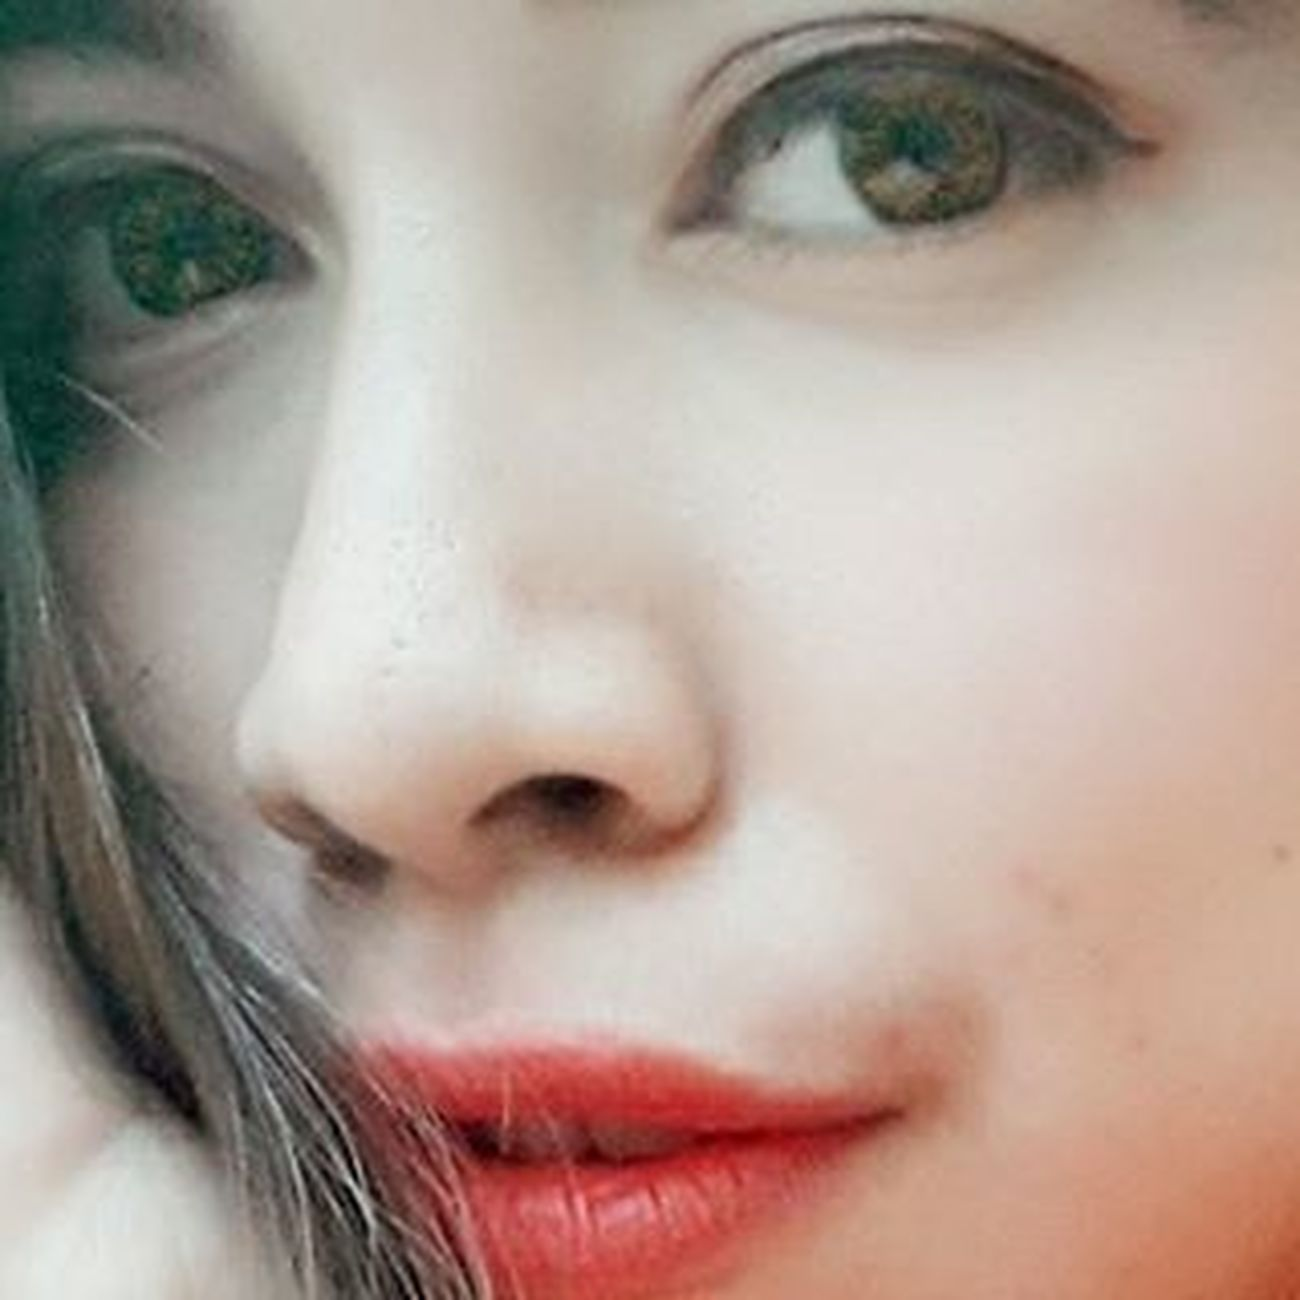 Big eyes n redlips 💋 EyeEm Eyeemphoto Ourselfieworld Selfie Bigeyes Redlips Lovely Loveit Helloworld Enjoyinglife  Instagram Like4like Likes